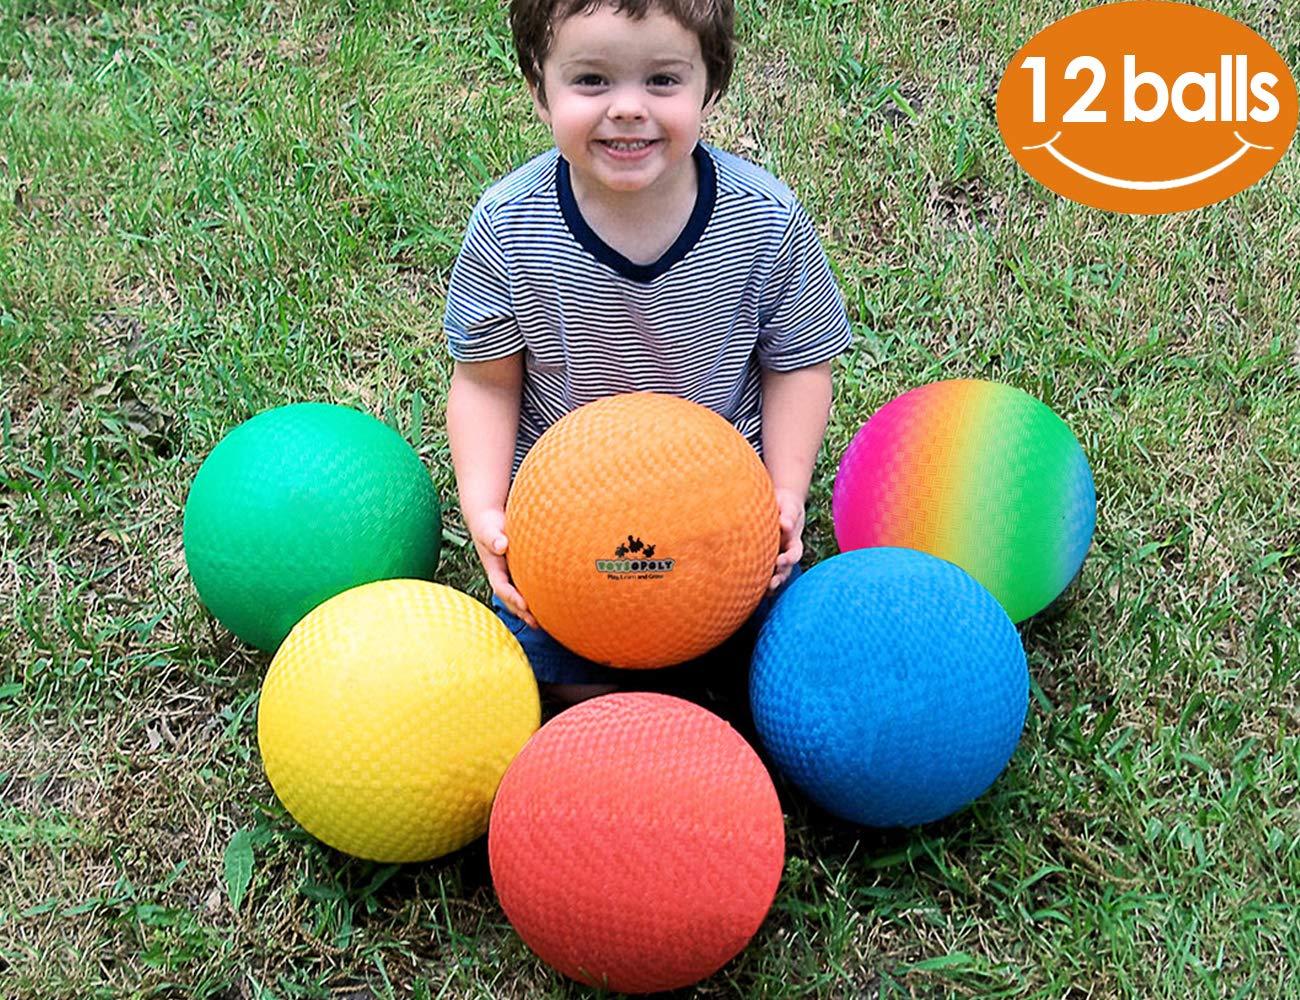 ToysOpoly プレイグラウンドボール 12 Balls B07HKD8BJ5  12 Balls